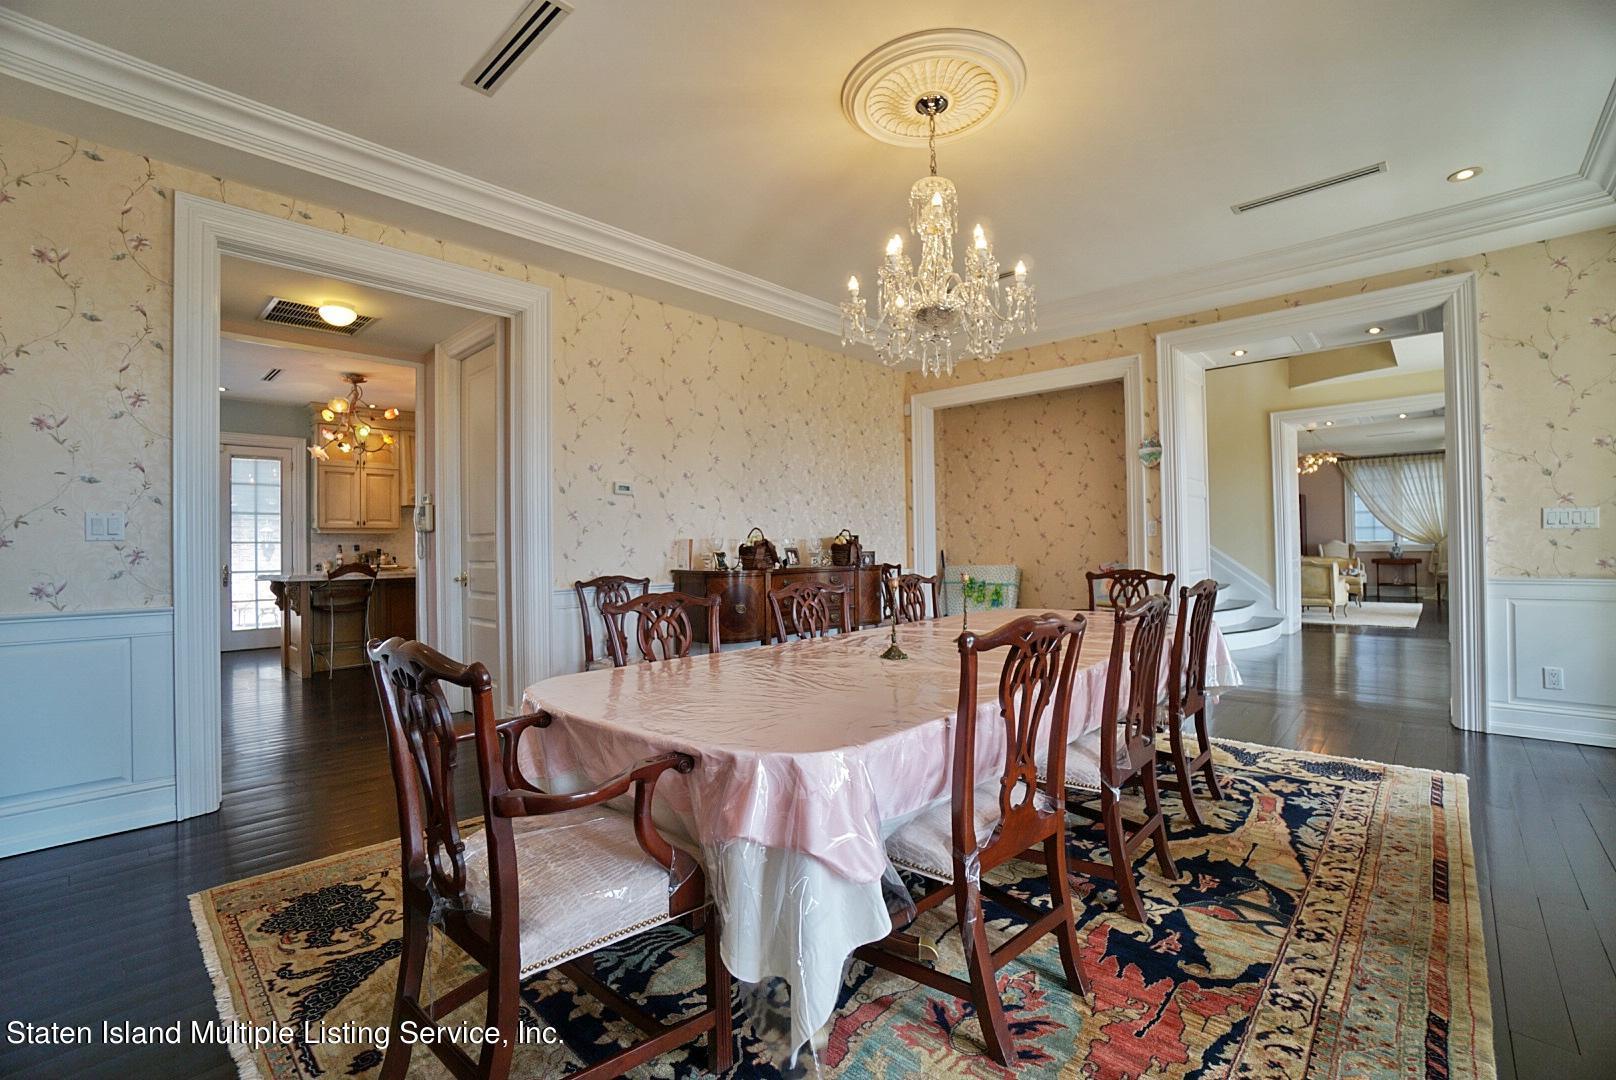 Single Family - Detached 129 Coverly Avenue   Staten Island, NY 10301, MLS-1144490-28